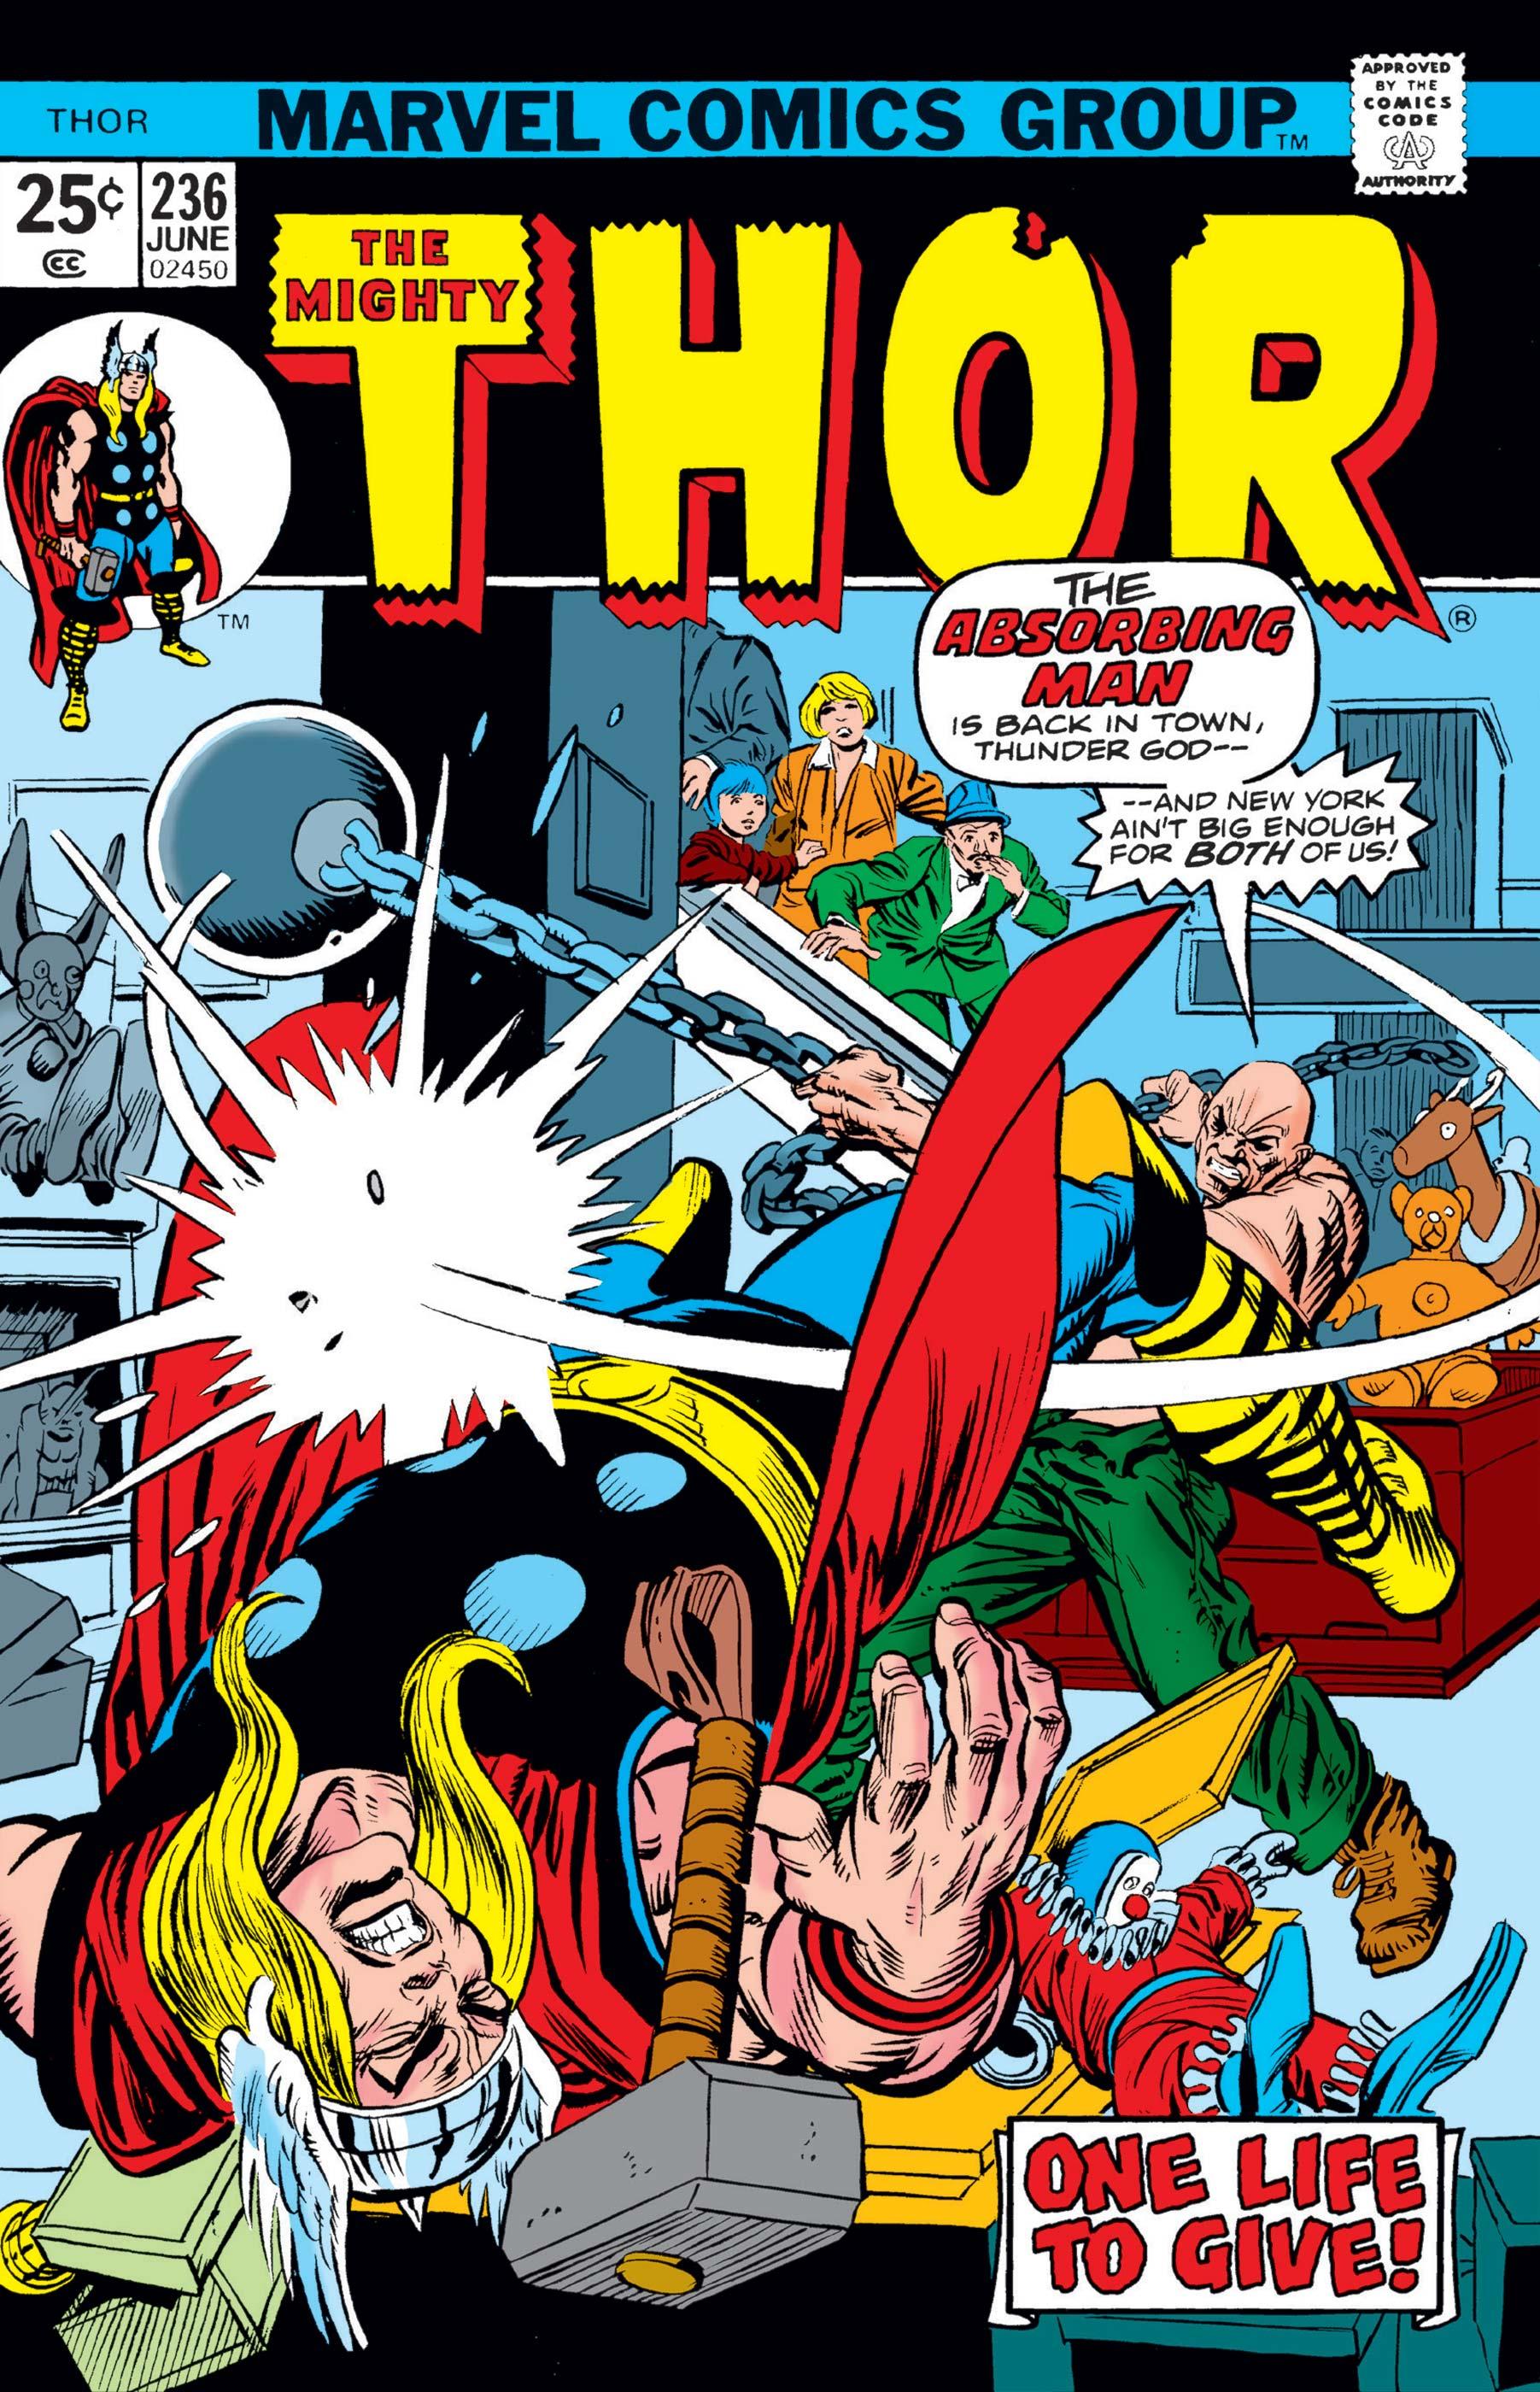 Thor (1966) #236